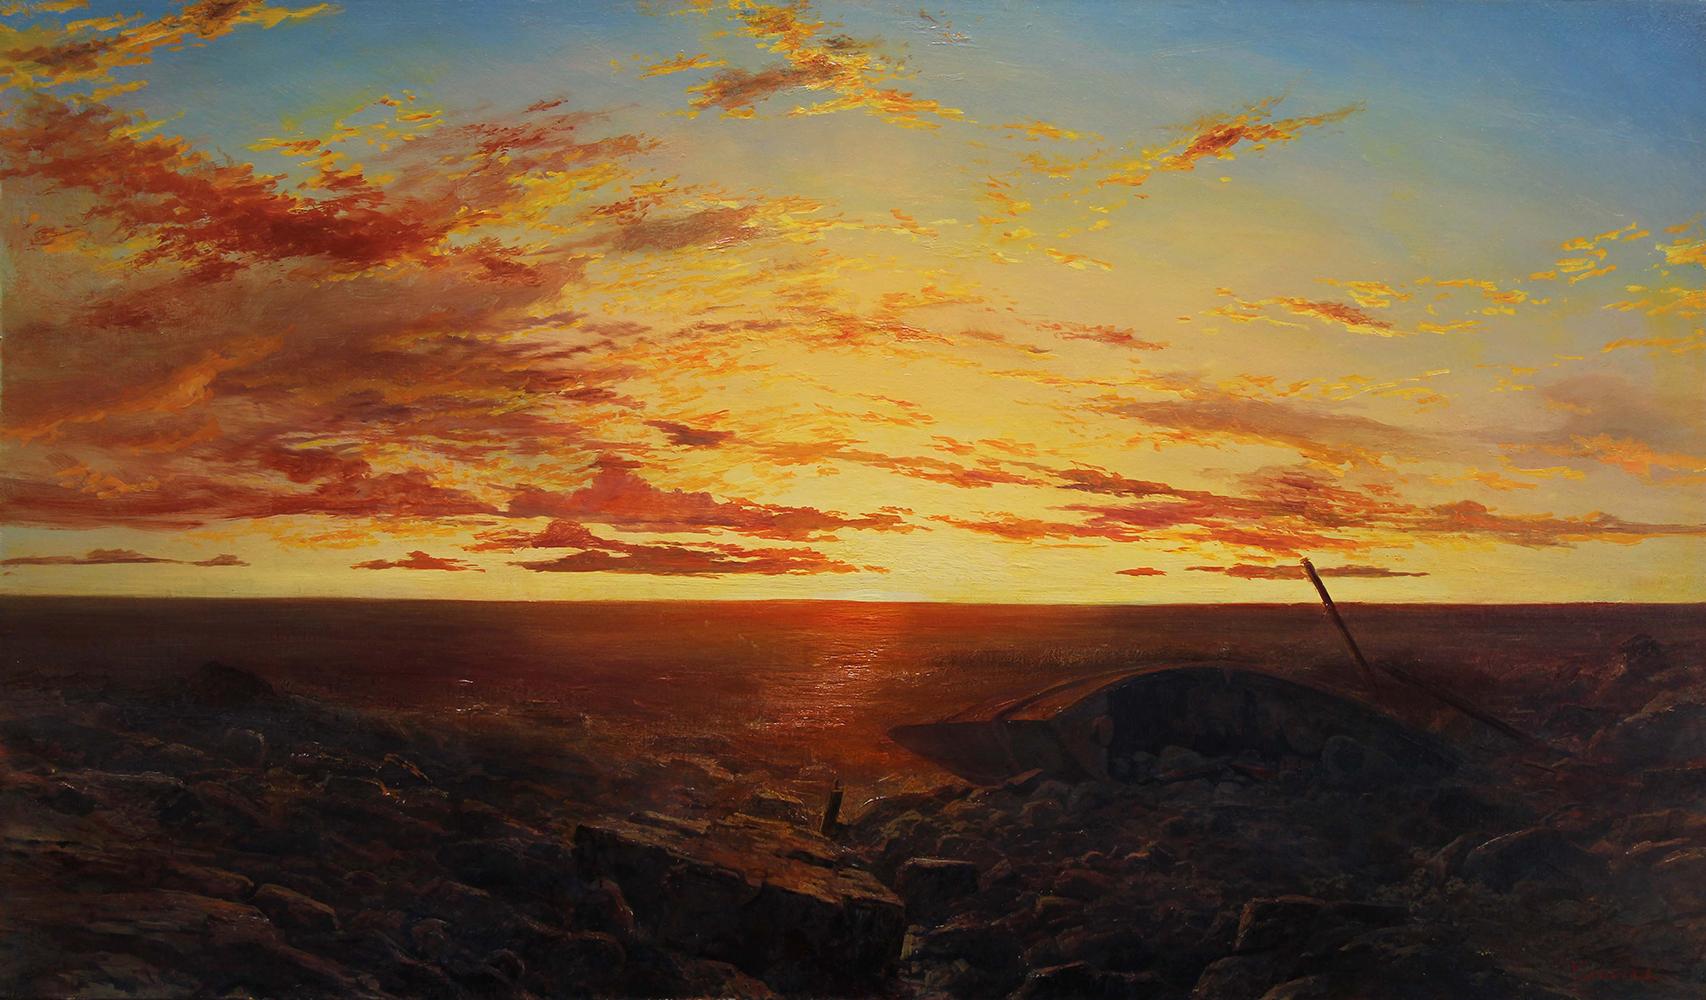 erik_koeppel_ek1064_sunset_over_the_d_t_sheridan_monhegan_island.jpg